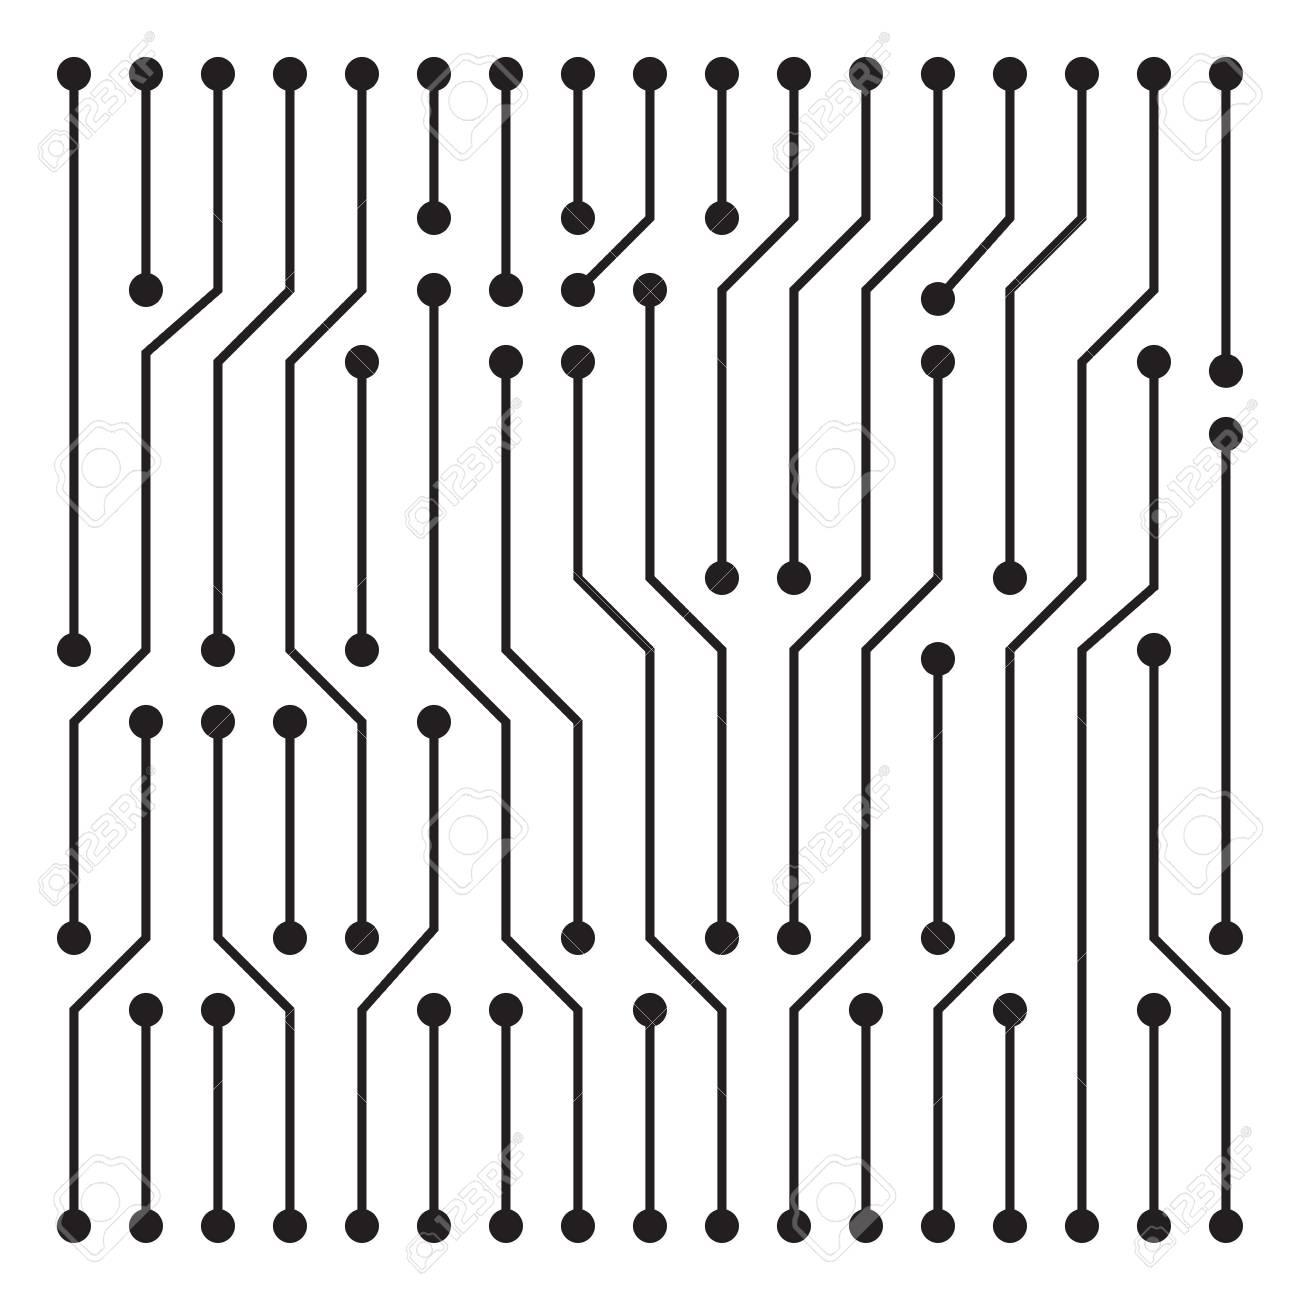 hight resolution of high tech circuit board texture beautiful banner wallpaper design illustration stock vector 81503228